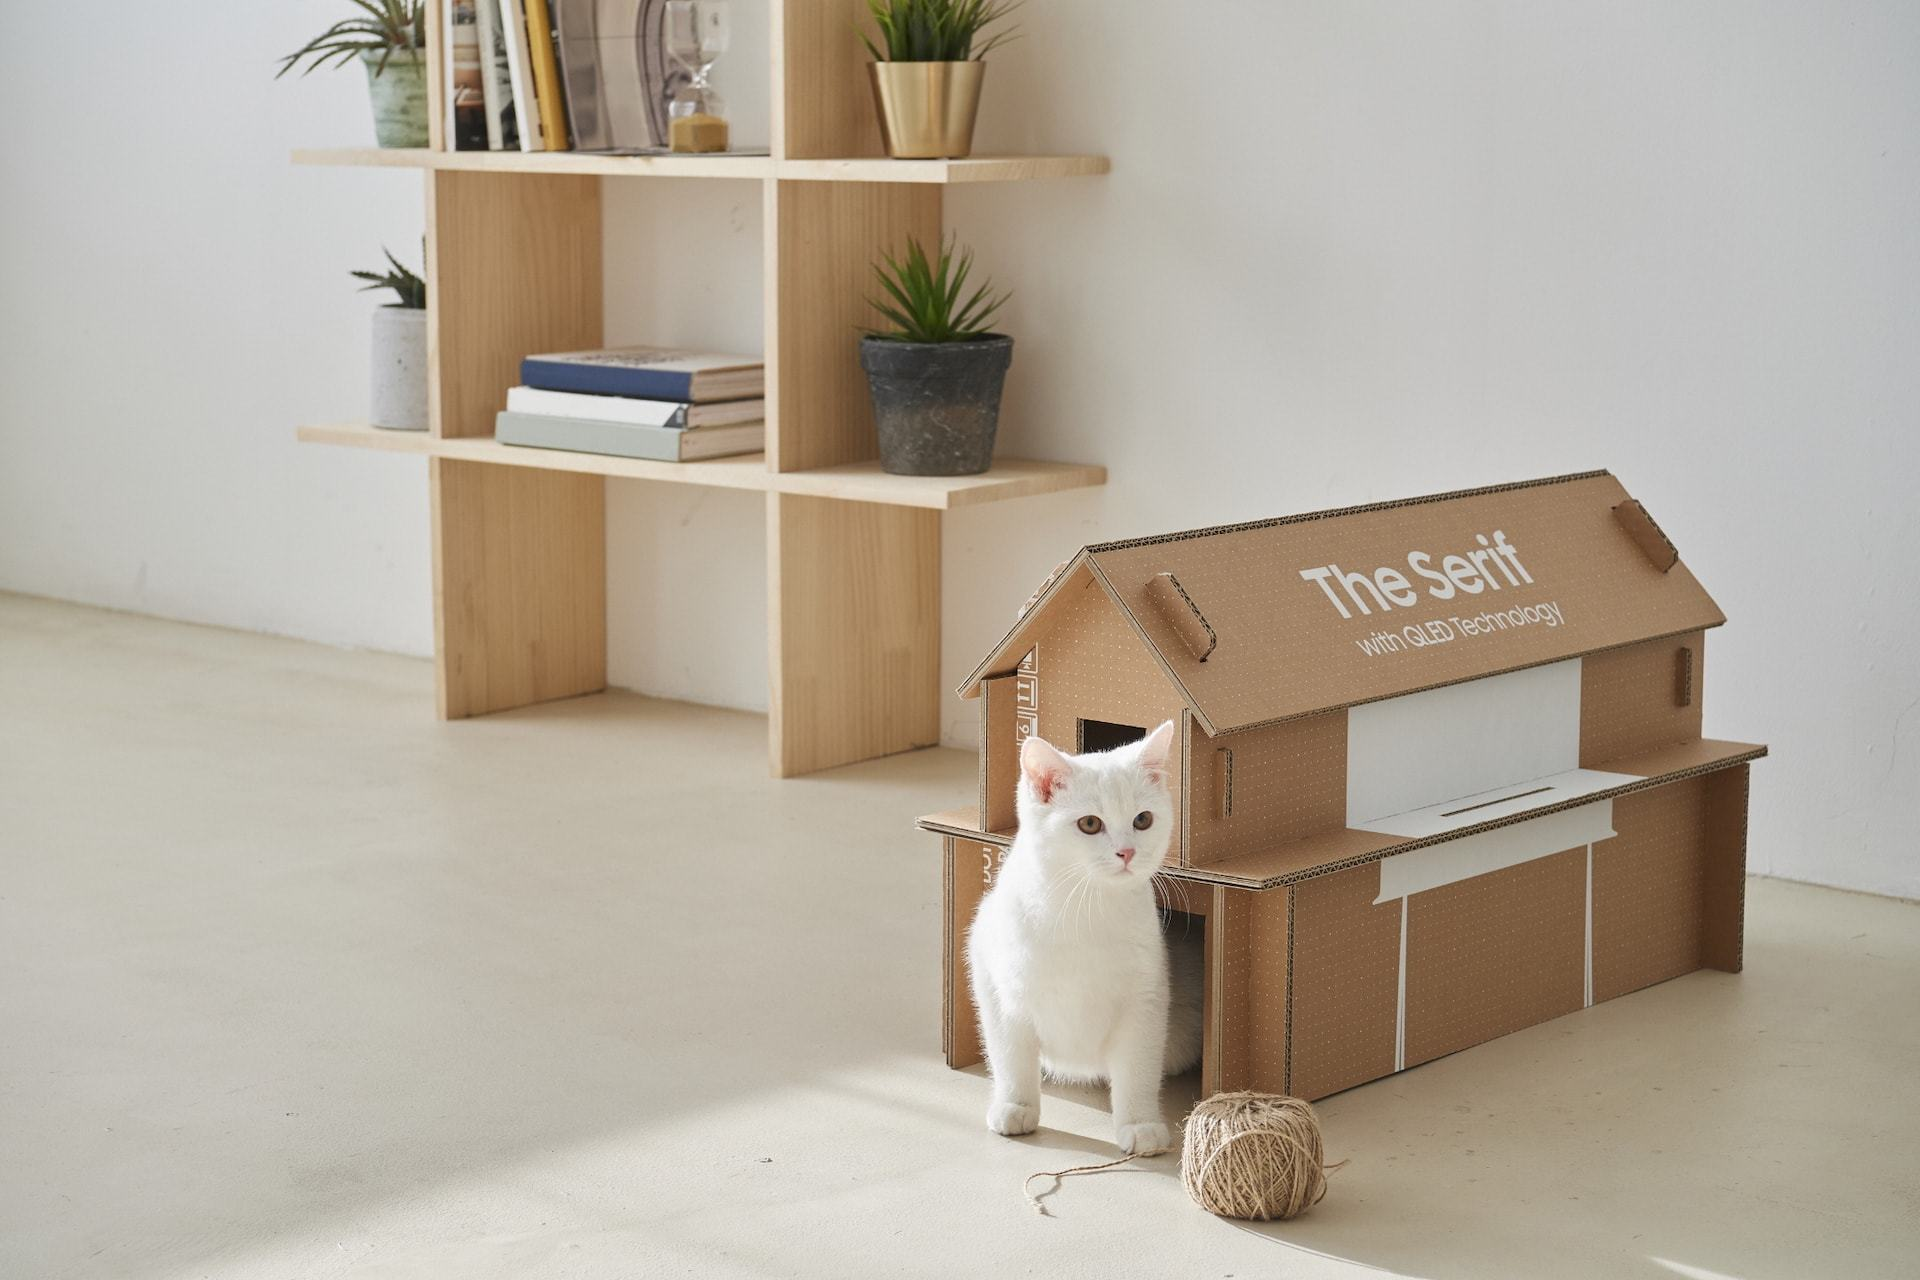 Casinha de gato feita de caixa de TV da Samsung.